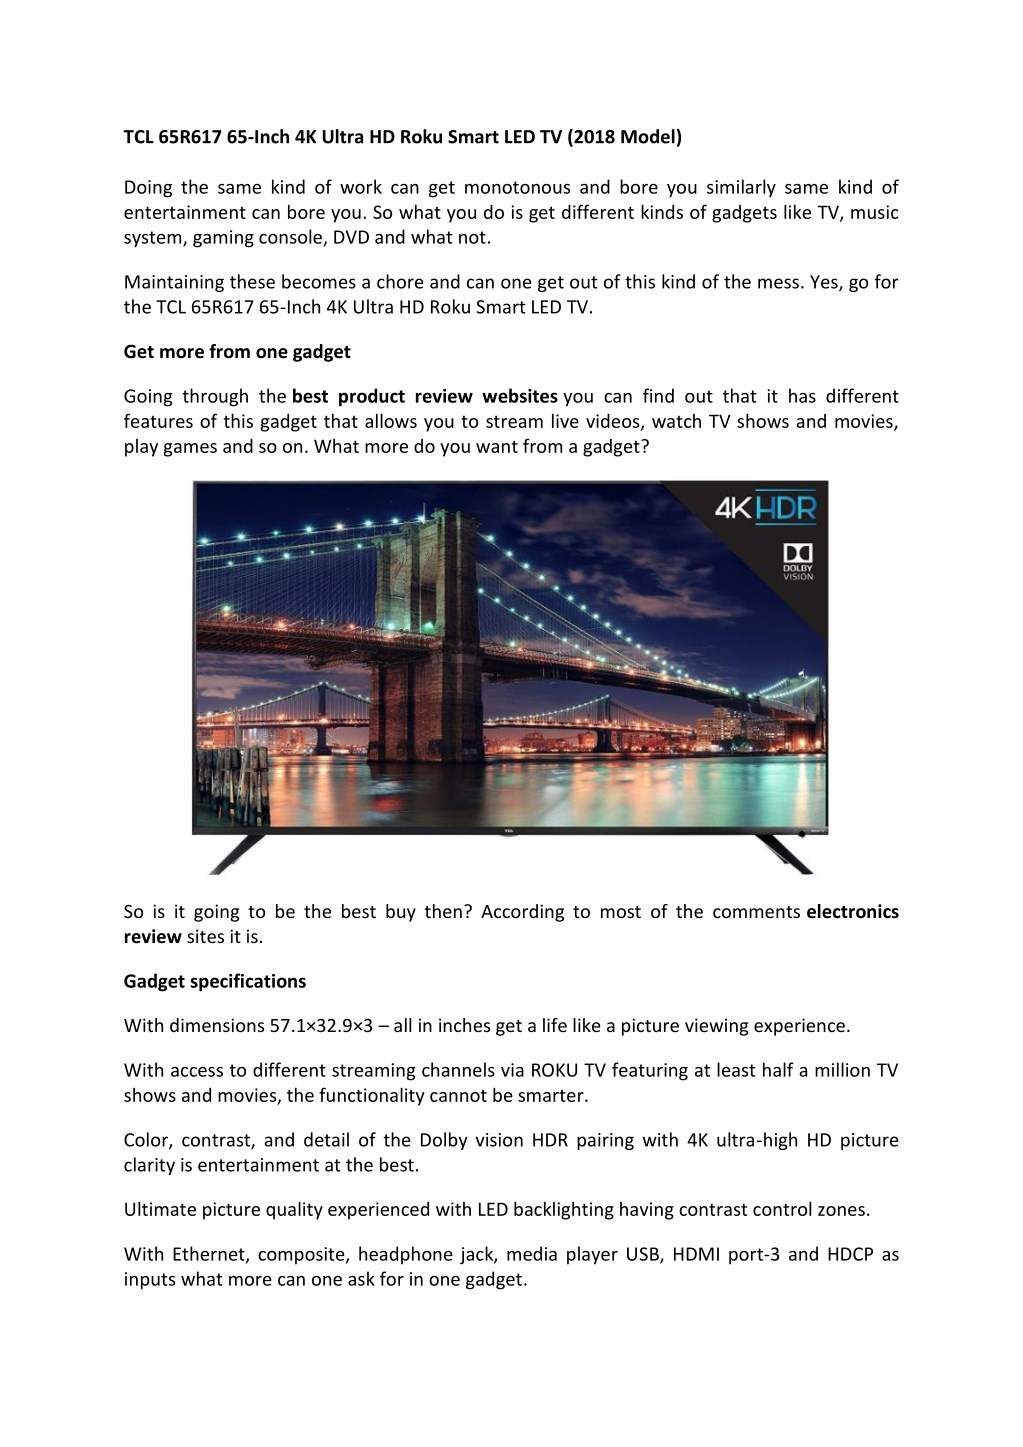 Ppt Tcl 65r617 65 Inch 4k Ultra Hd Roku Smart Led Tv Reviews